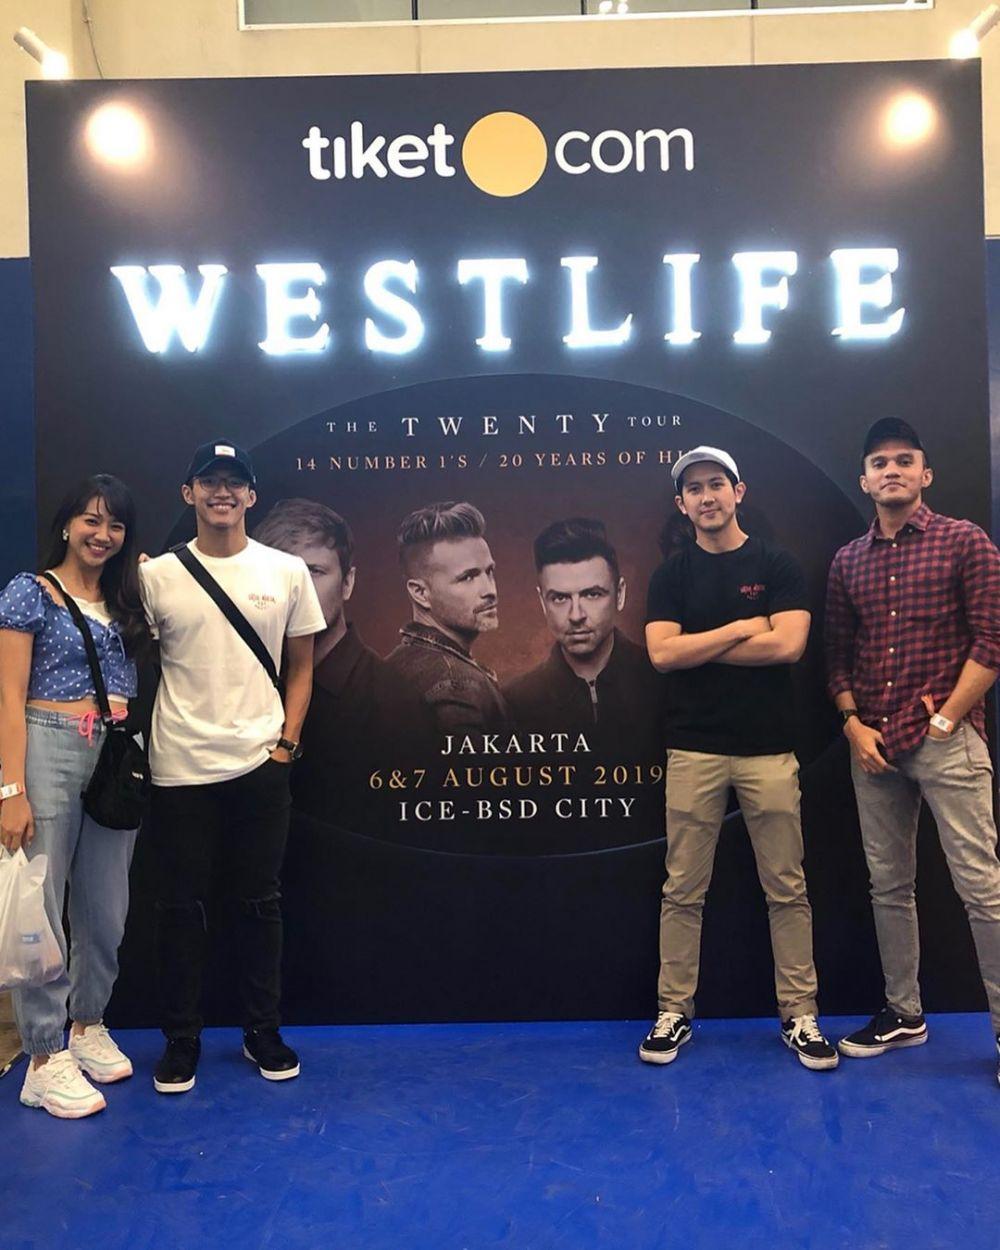 Jonatan Christie dan Shanju eks JKT48 instagram